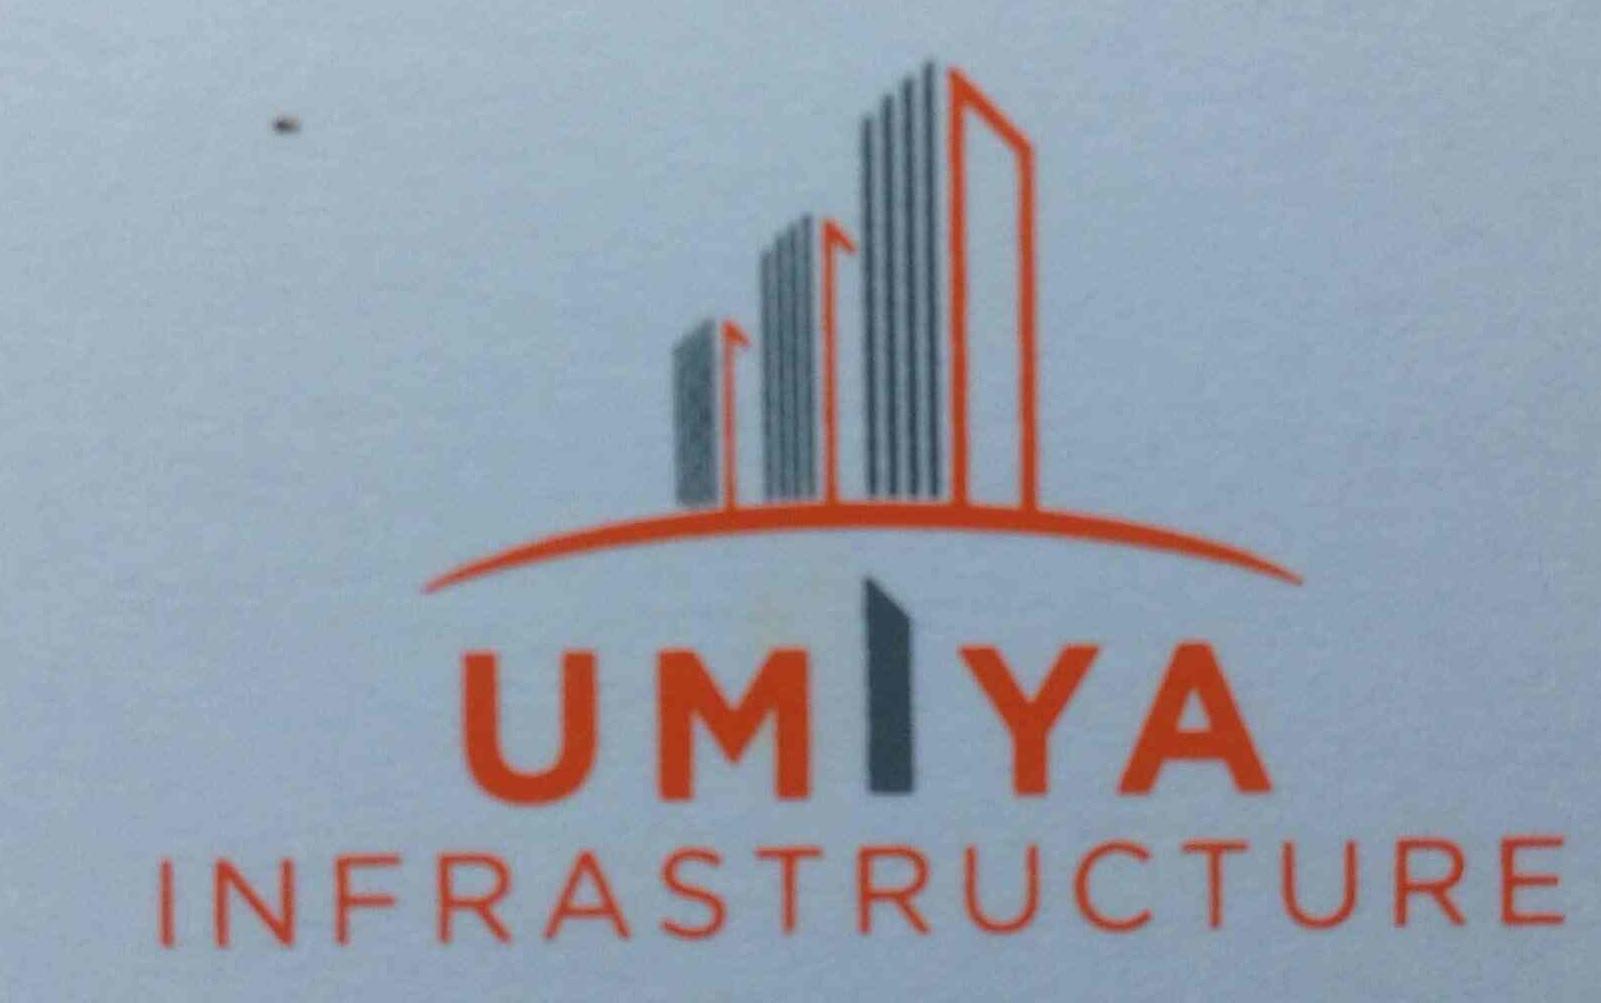 Umiya Infrastructure